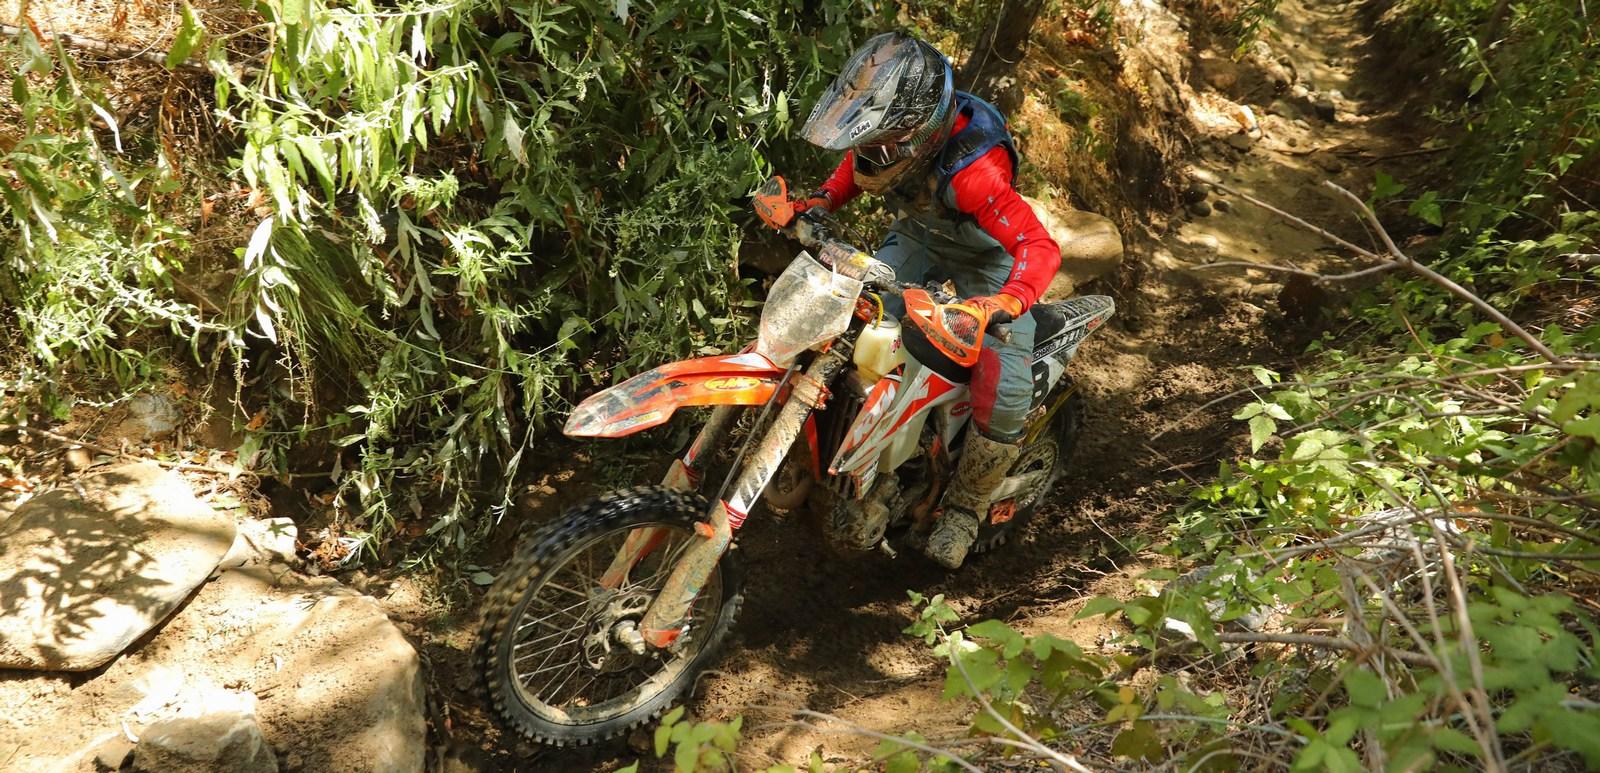 2019-bike-09-brandy-richards-worcs-racing